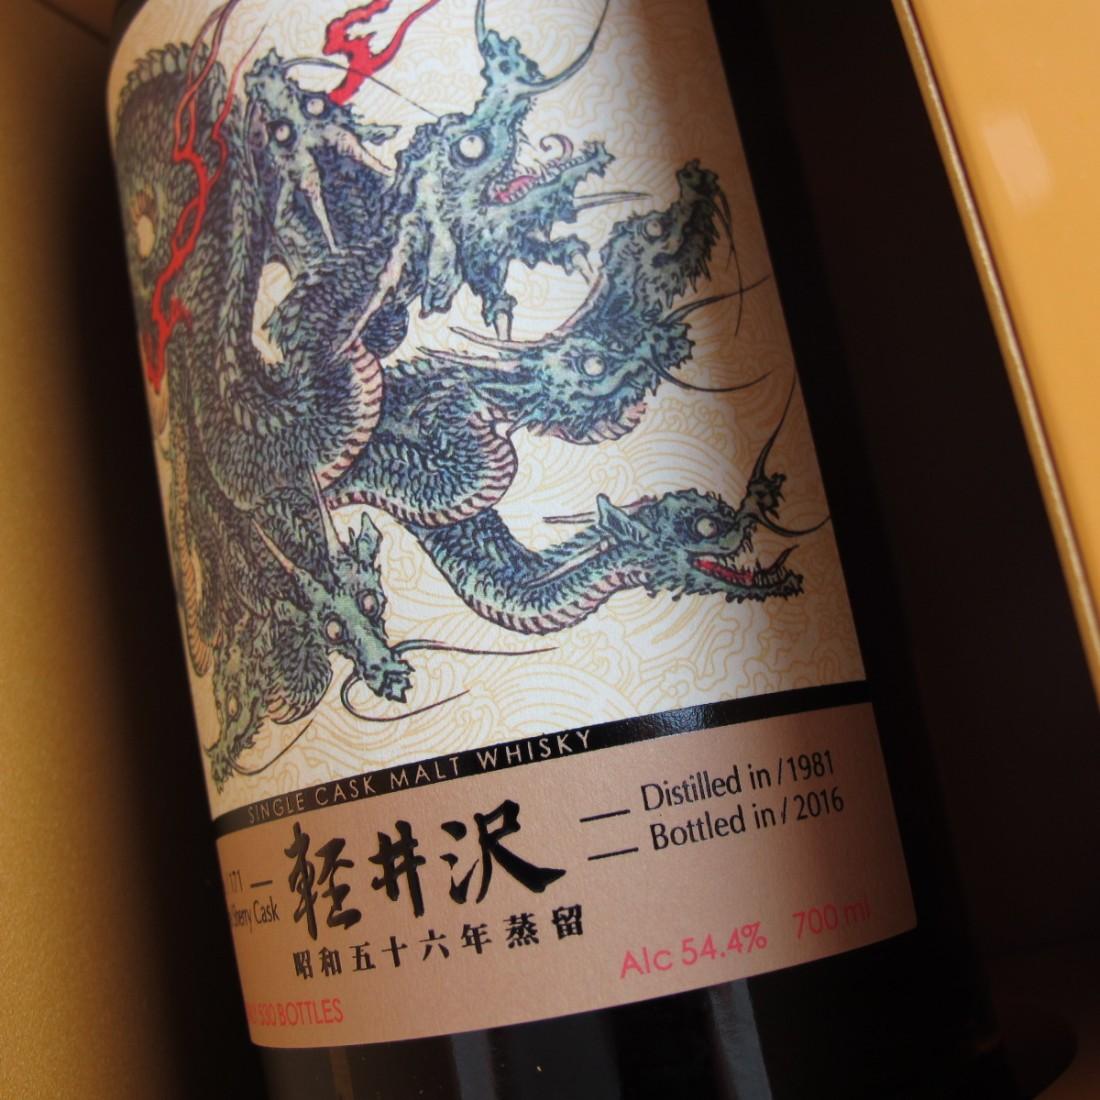 Karuizawa 1981 Single Cask 35 Year Old #171 / 8-Headed Dragon